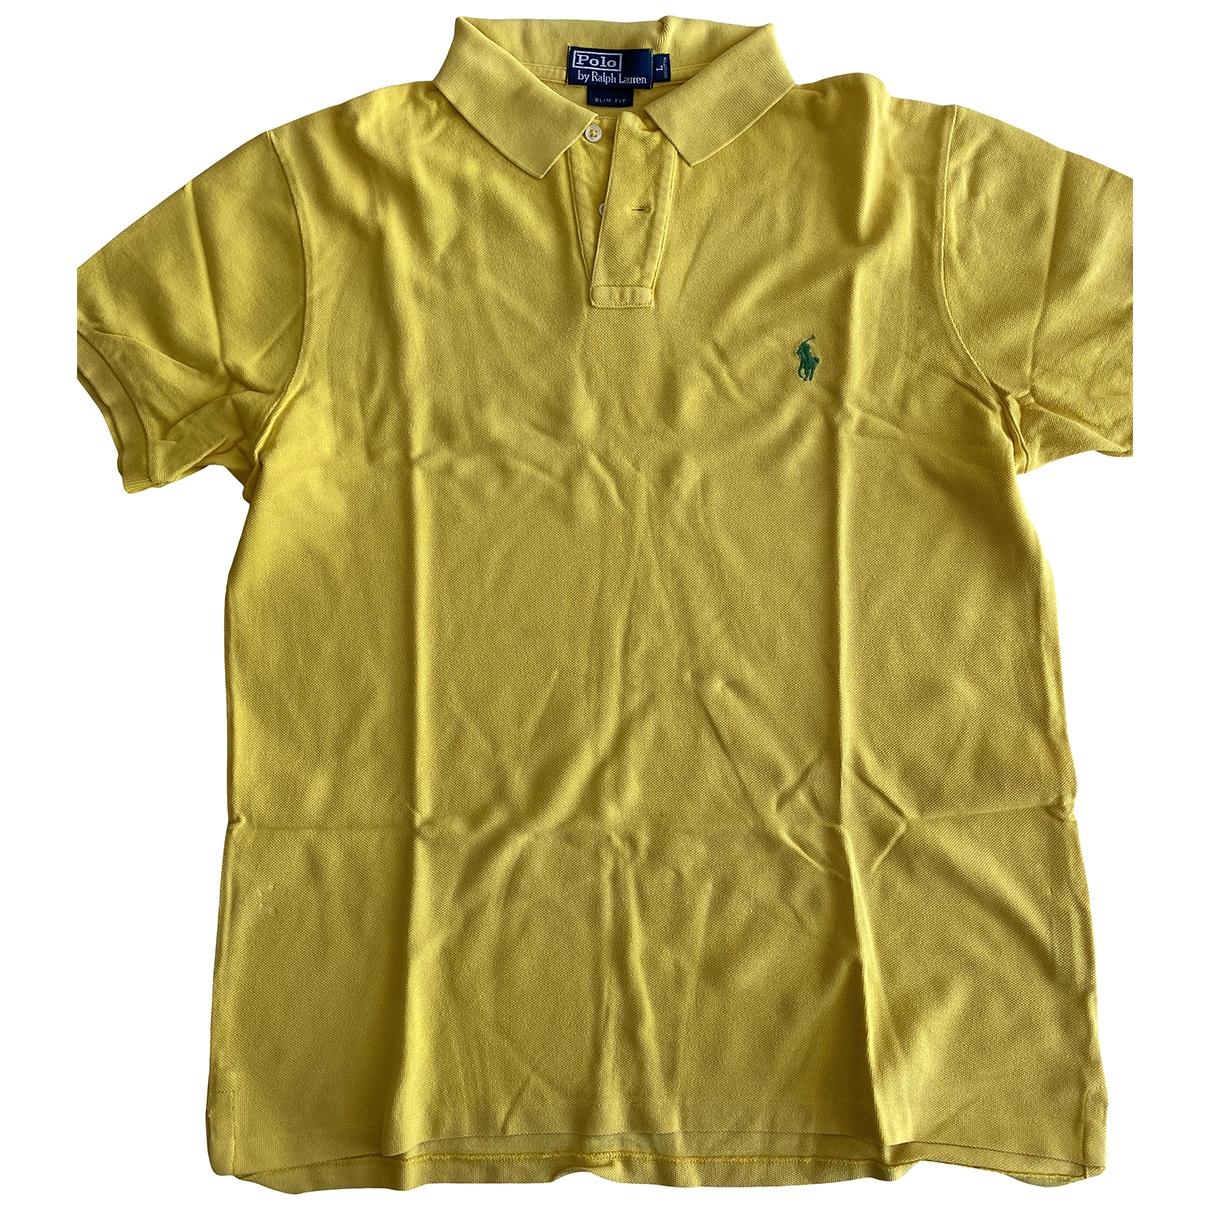 Polo Ralph Lauren Polo classique manches courtes Yellow Cotton Polo shirts for Men L International